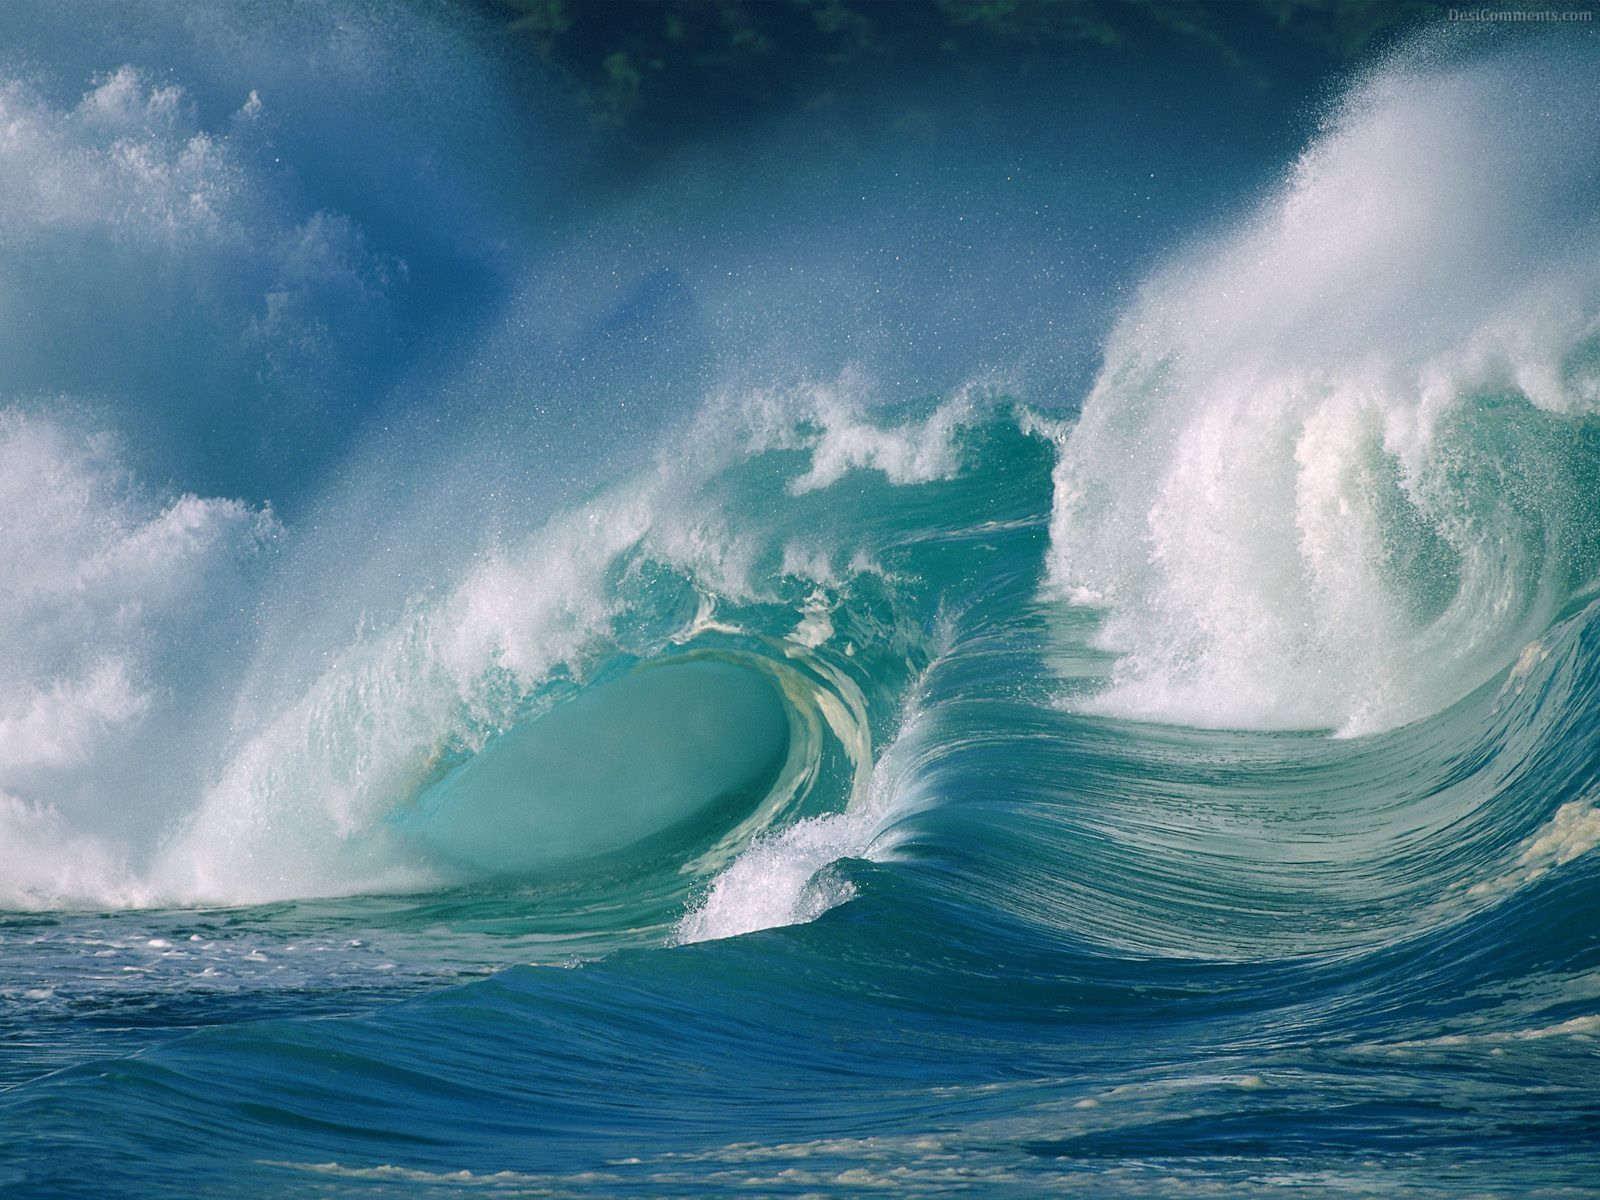 ocean wallpaper waves cool